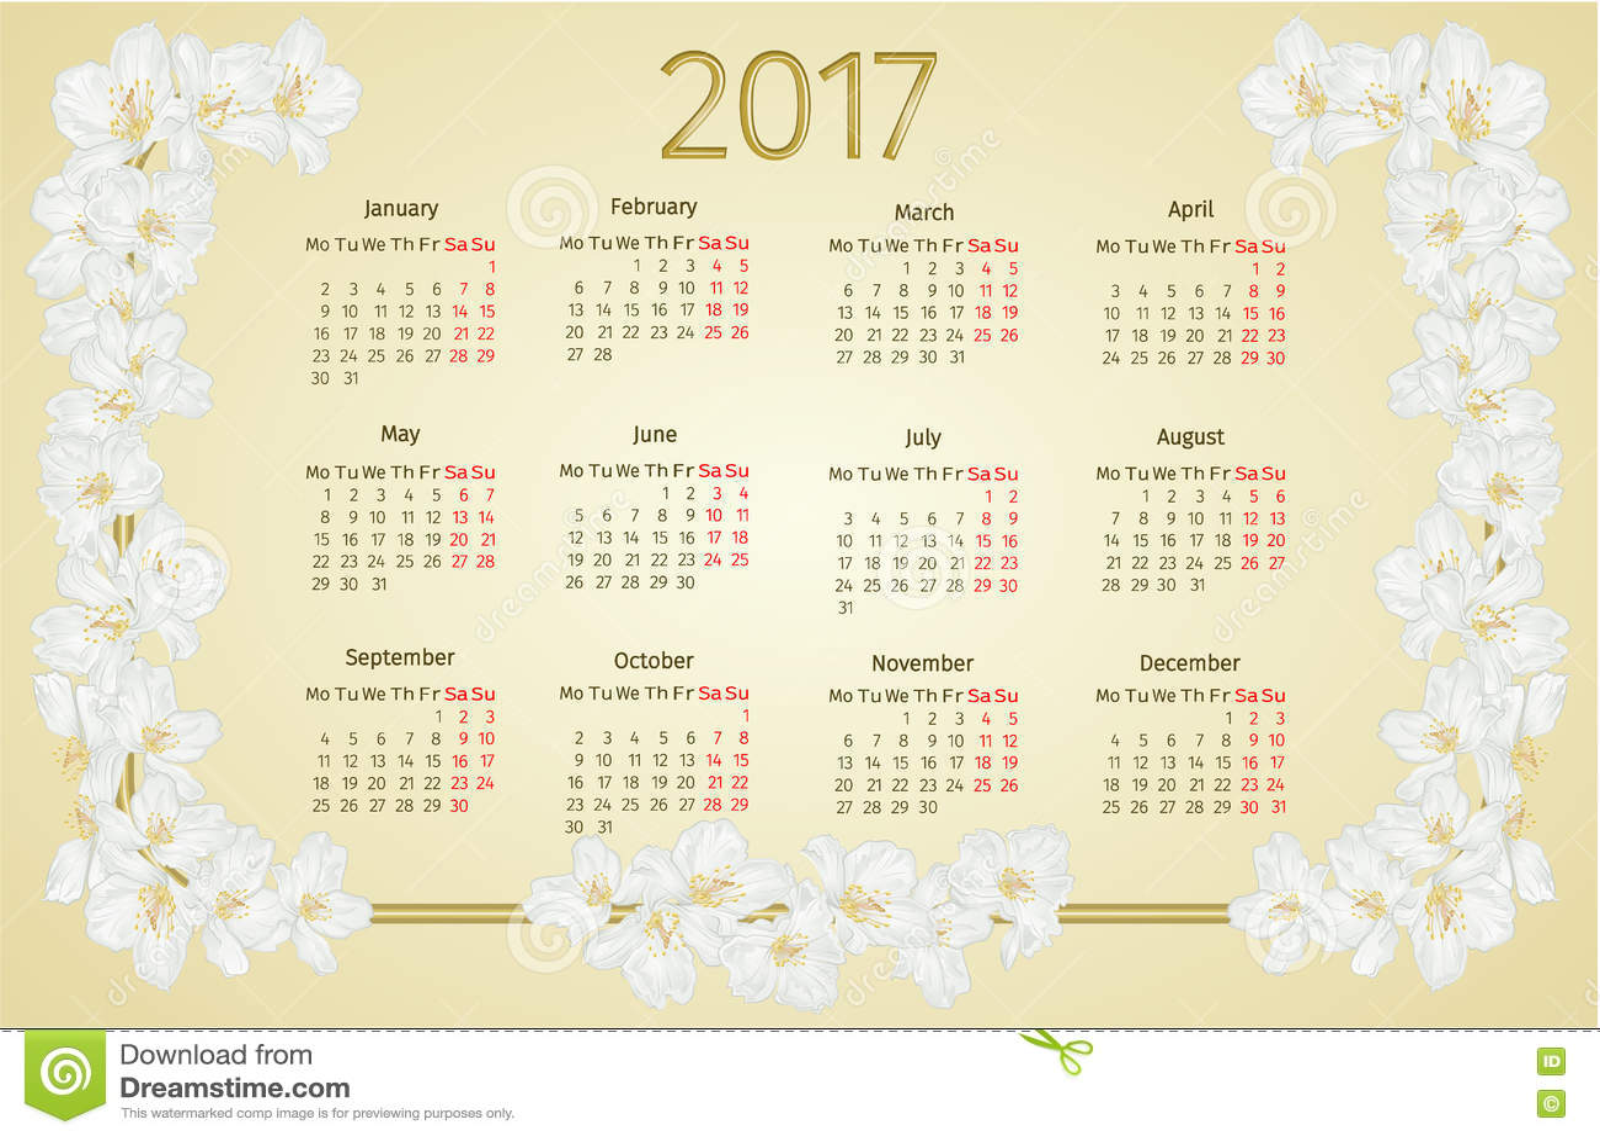 Calendar 2017 With Jasmine Flowers Vintage Vector Stock Vector - Image ...